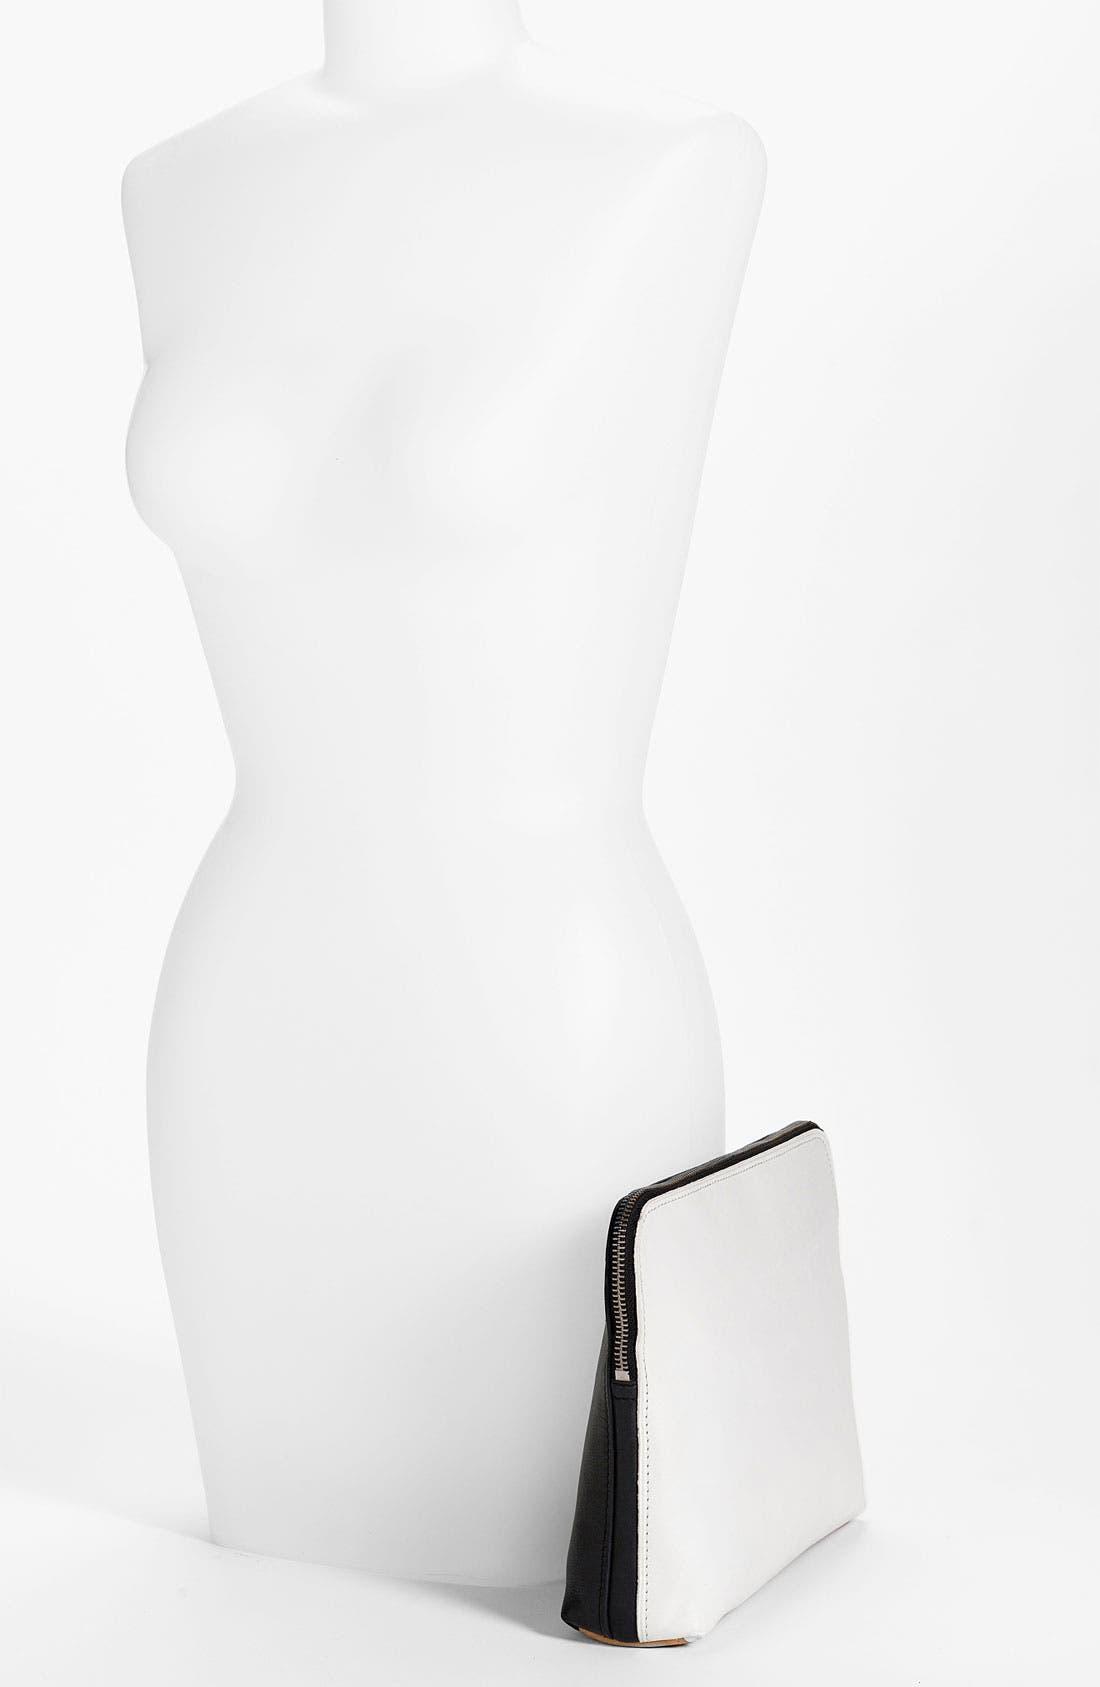 Alternate Image 2  - 3.1 Phillip Lim '31 Minute' Leather Bag